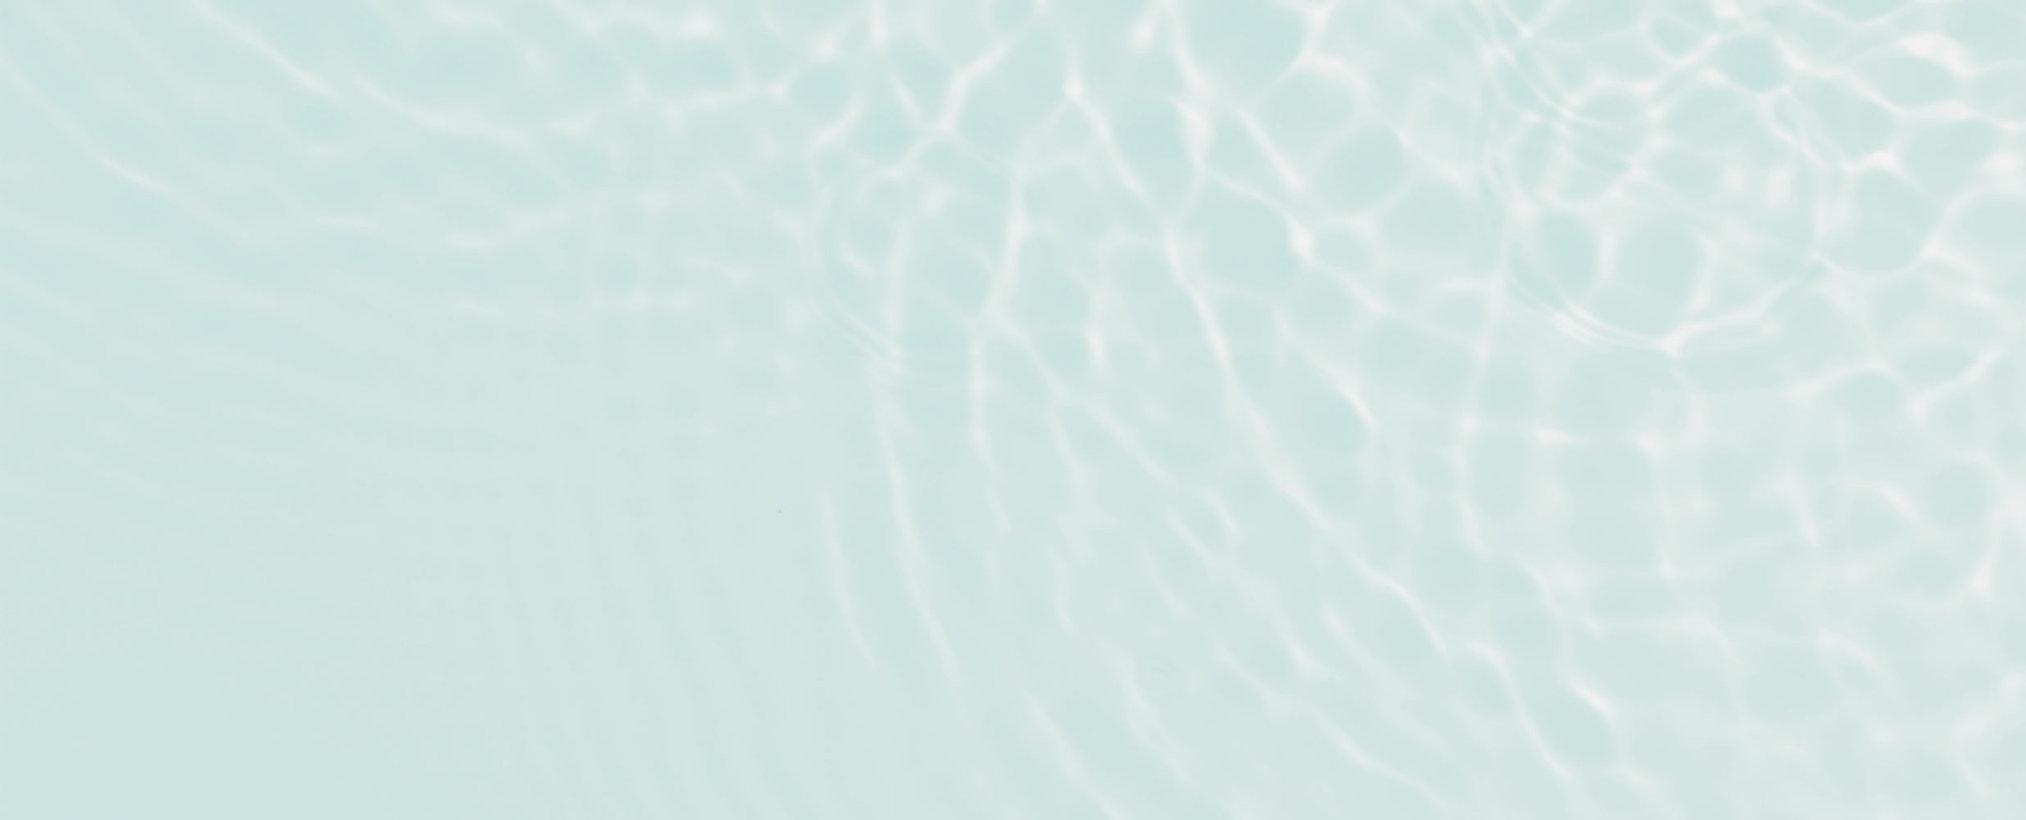 form_water_bg.jpg